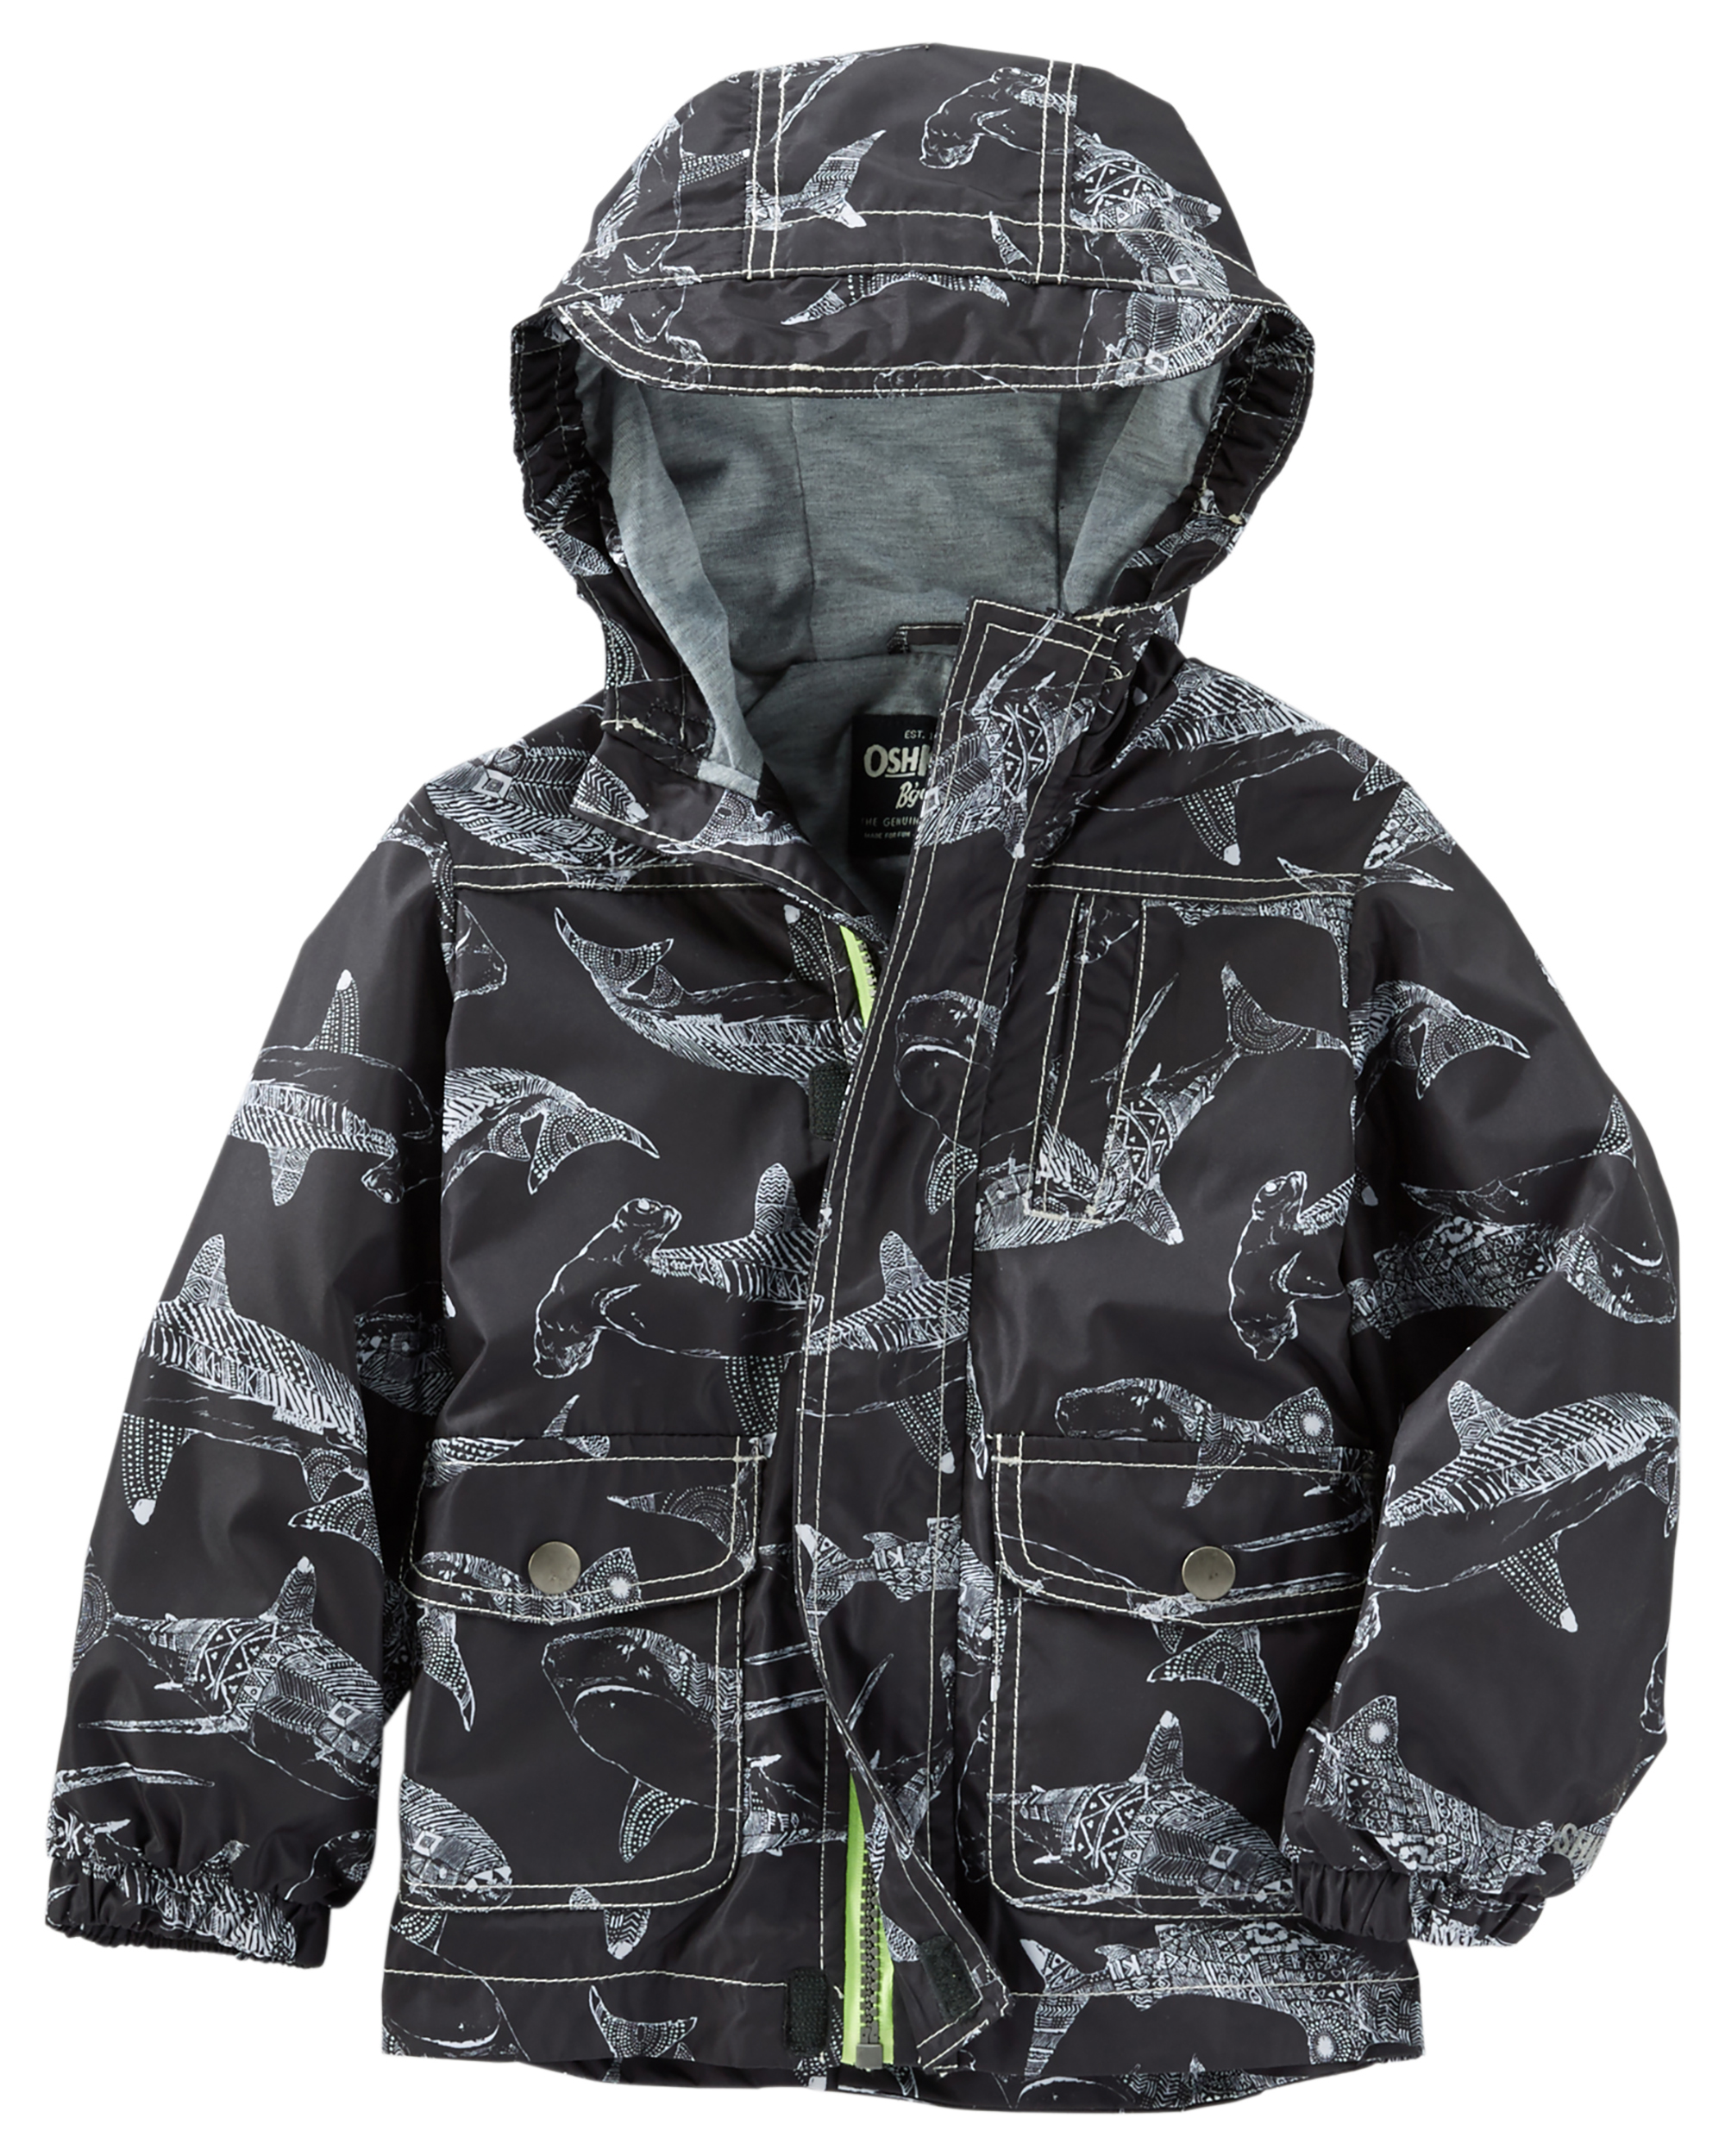 new style 142a5 e033c OshKosh Jersey-Lined Rain Jacket | oshkosh.com